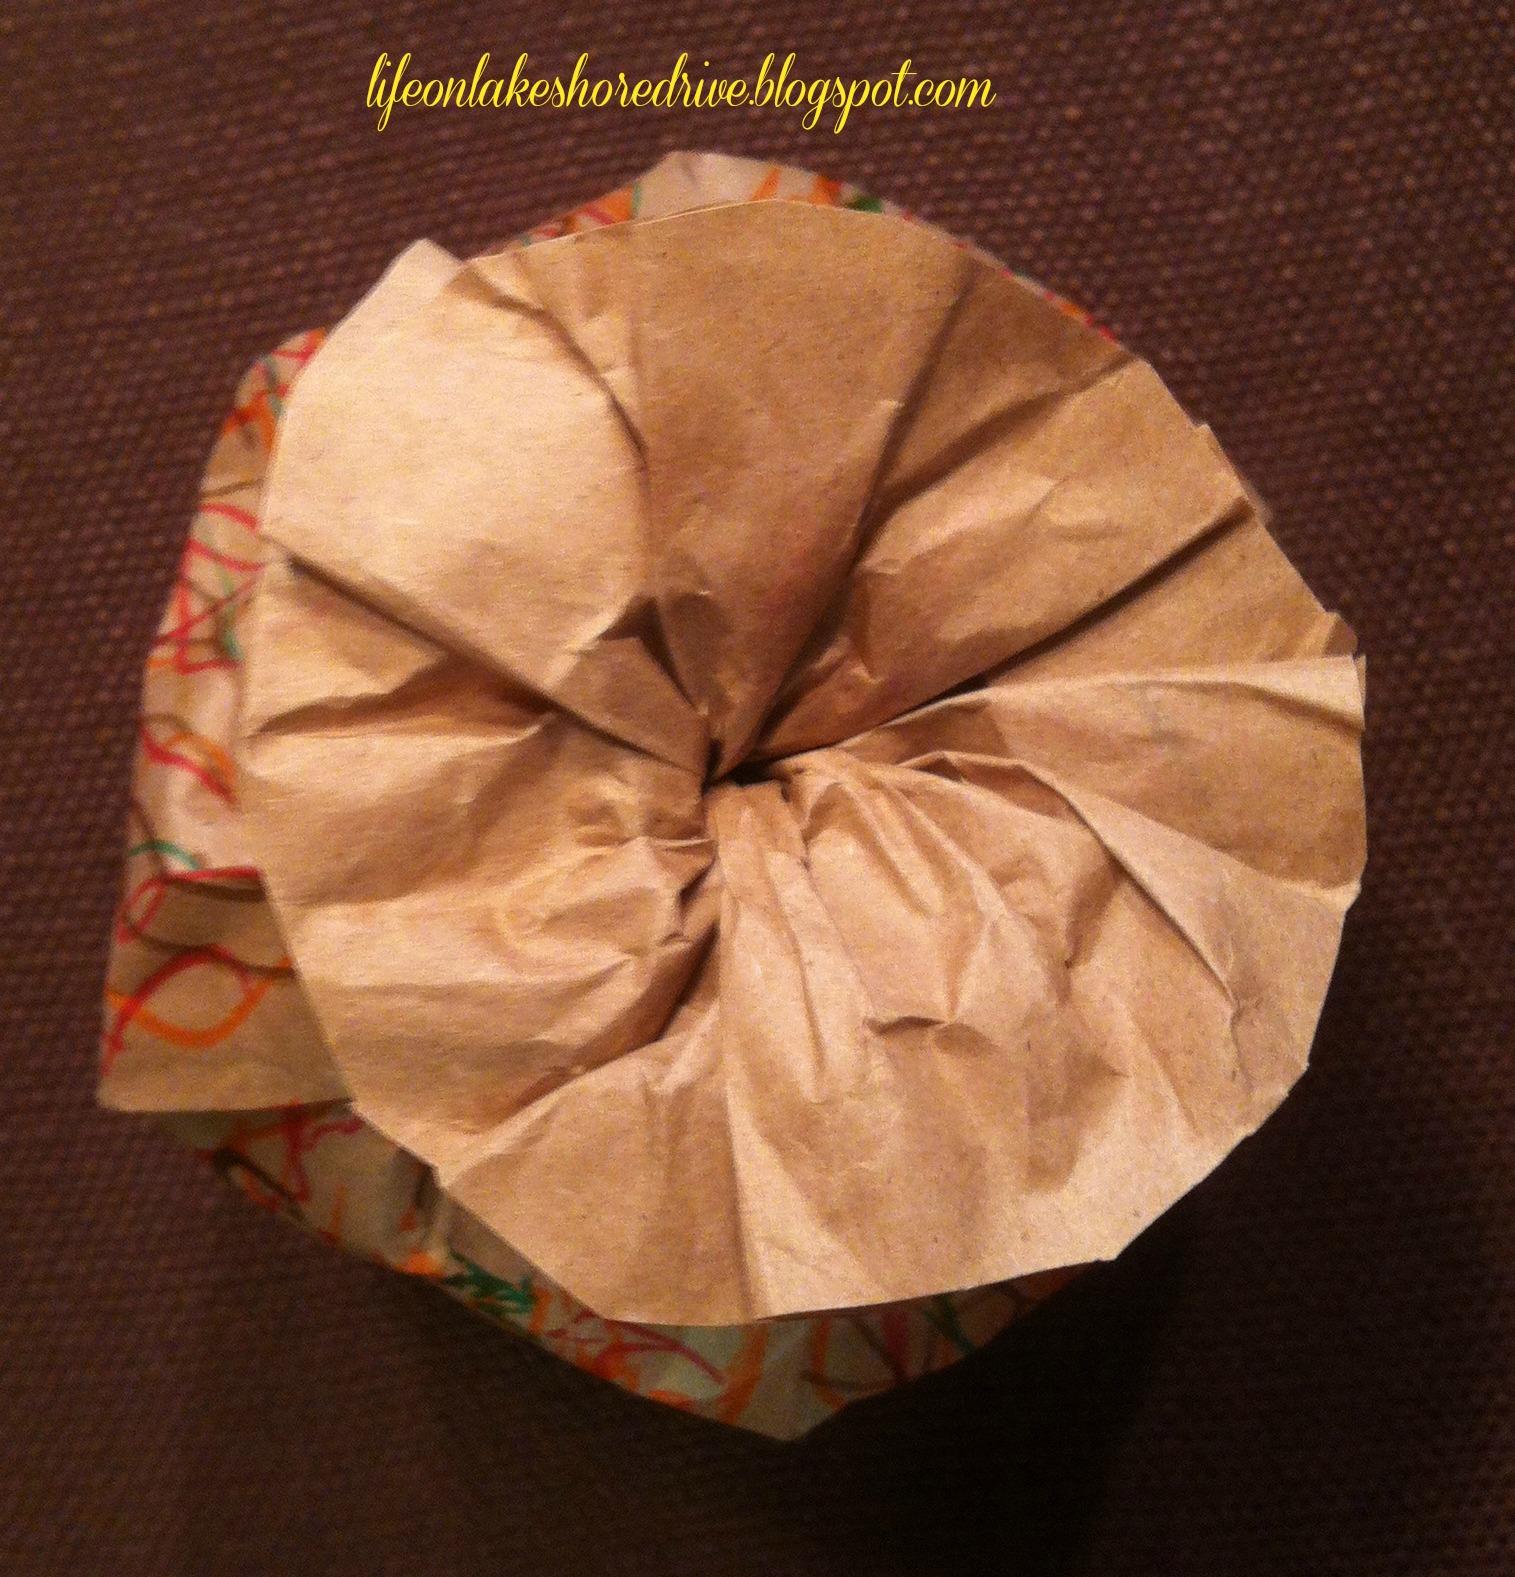 Paper bag turkey craft for kids life on lakeshore drive altkids craft brown paper bag turkey craft tutorial jeuxipadfo Gallery